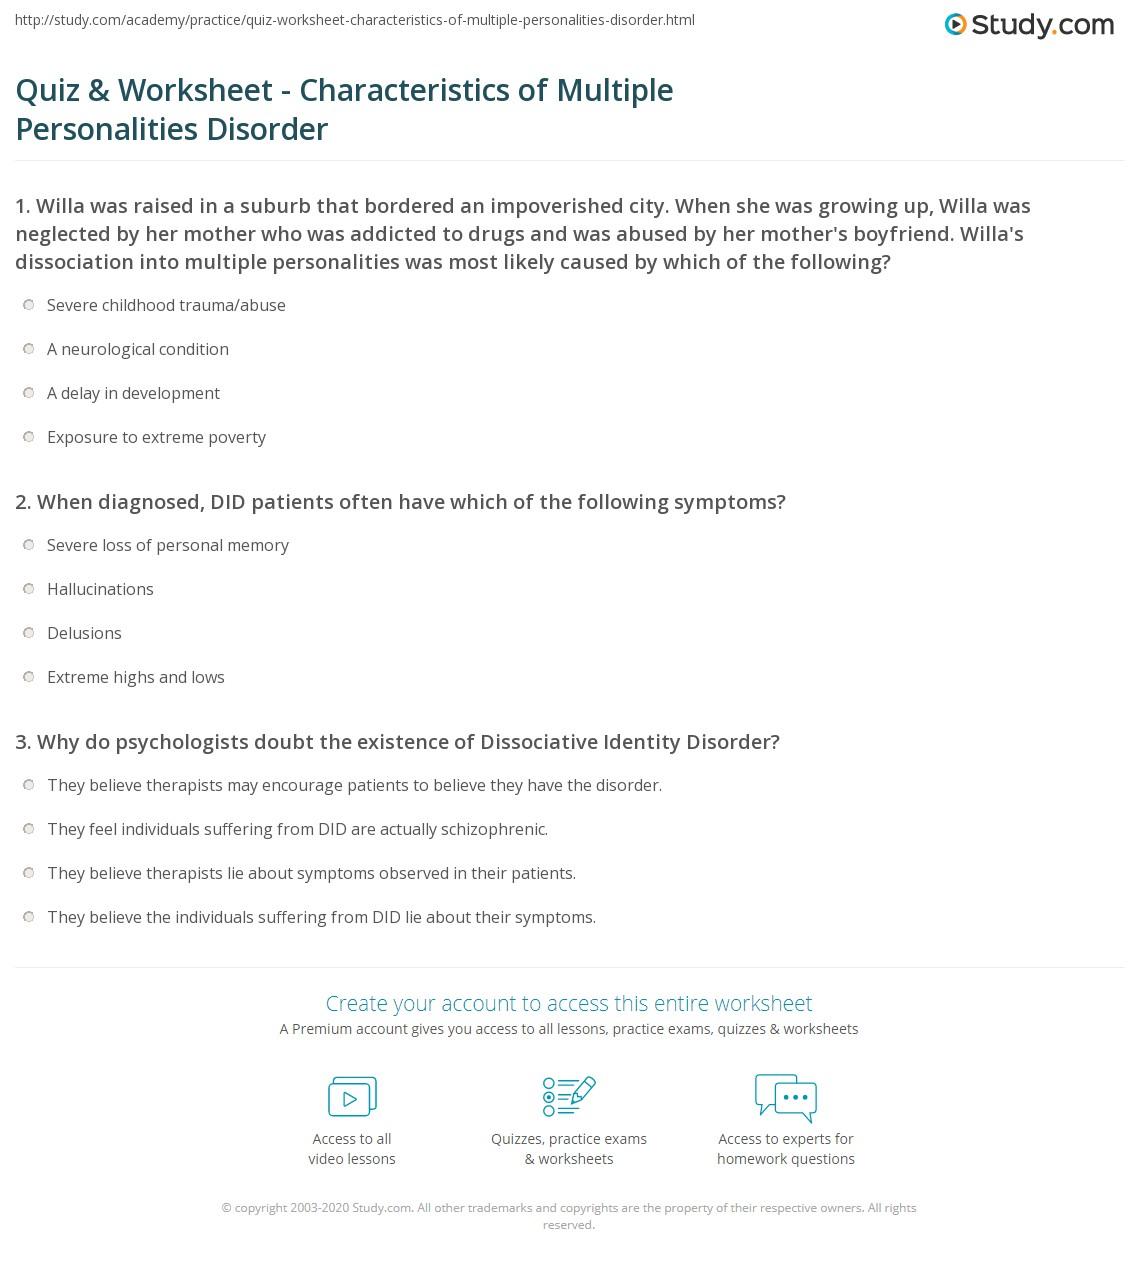 Quiz & Worksheet - Characteristics of Multiple Personalities Disorder ...